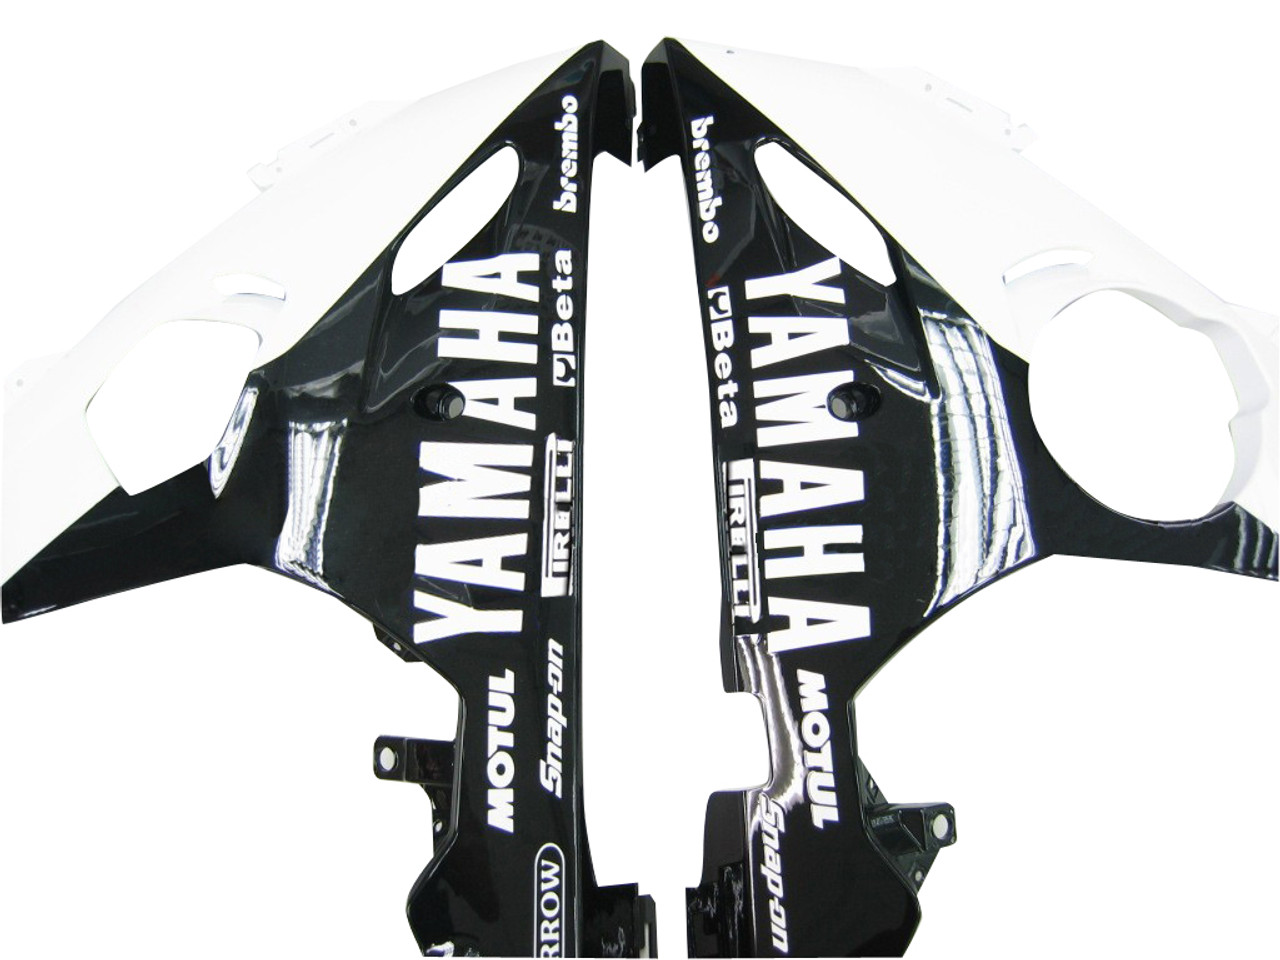 Fairings Yamaha YZF-R6 Black & White Tribal R6 Racing (2003-2005)